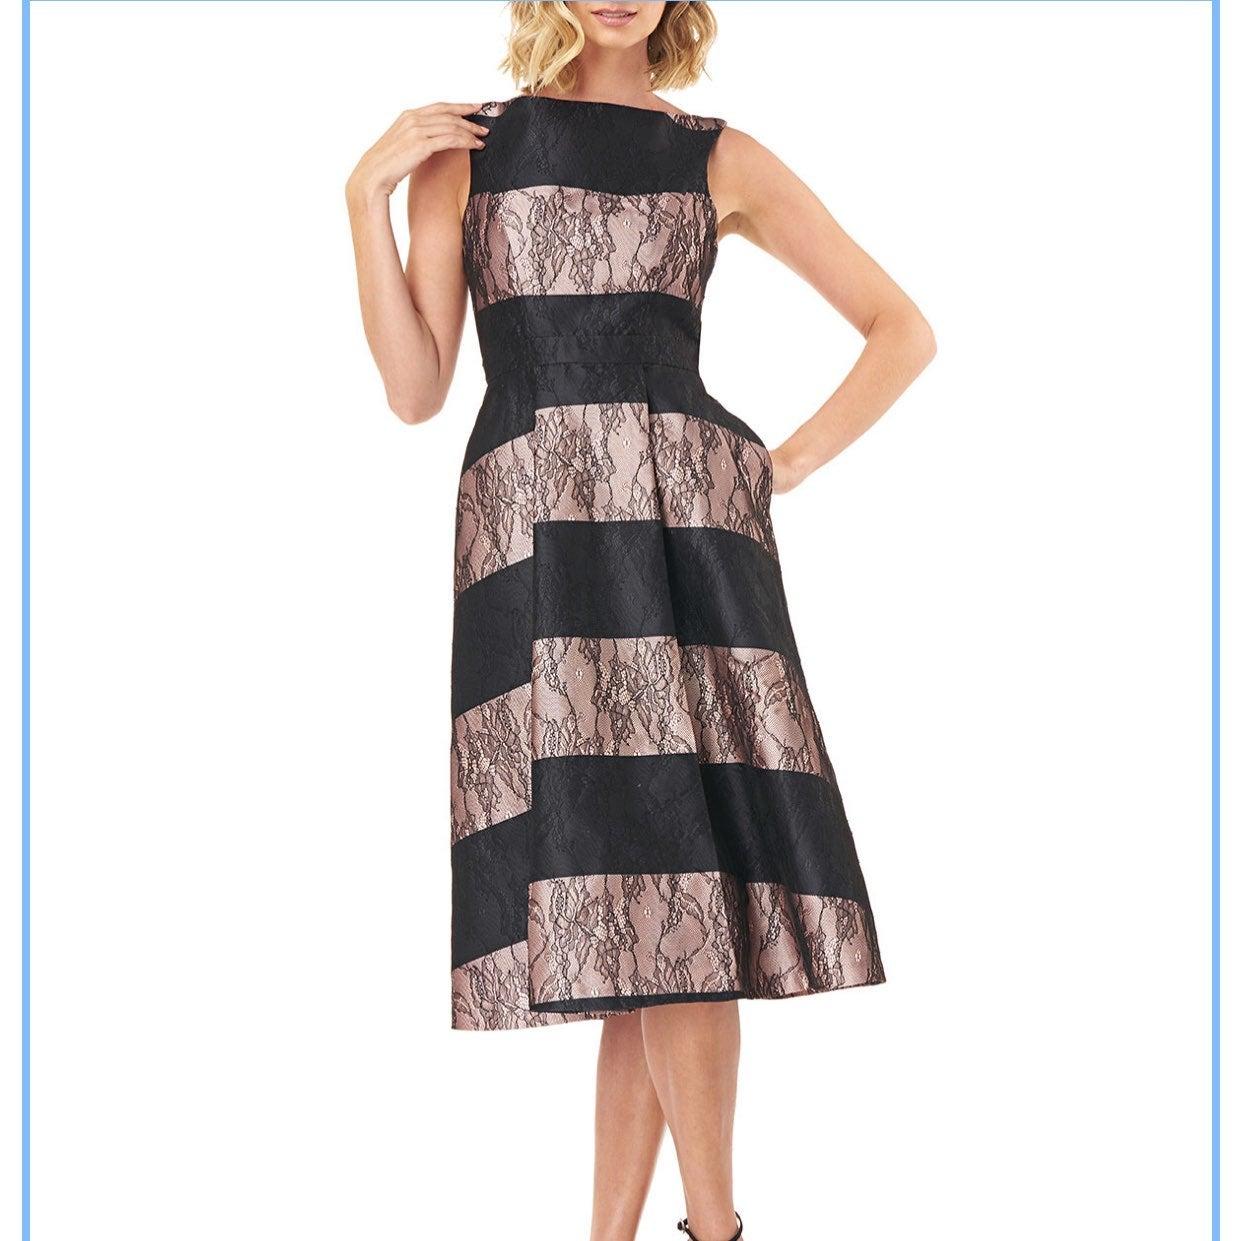 NWT Kay Unger Sarah Lace Dress Size 2